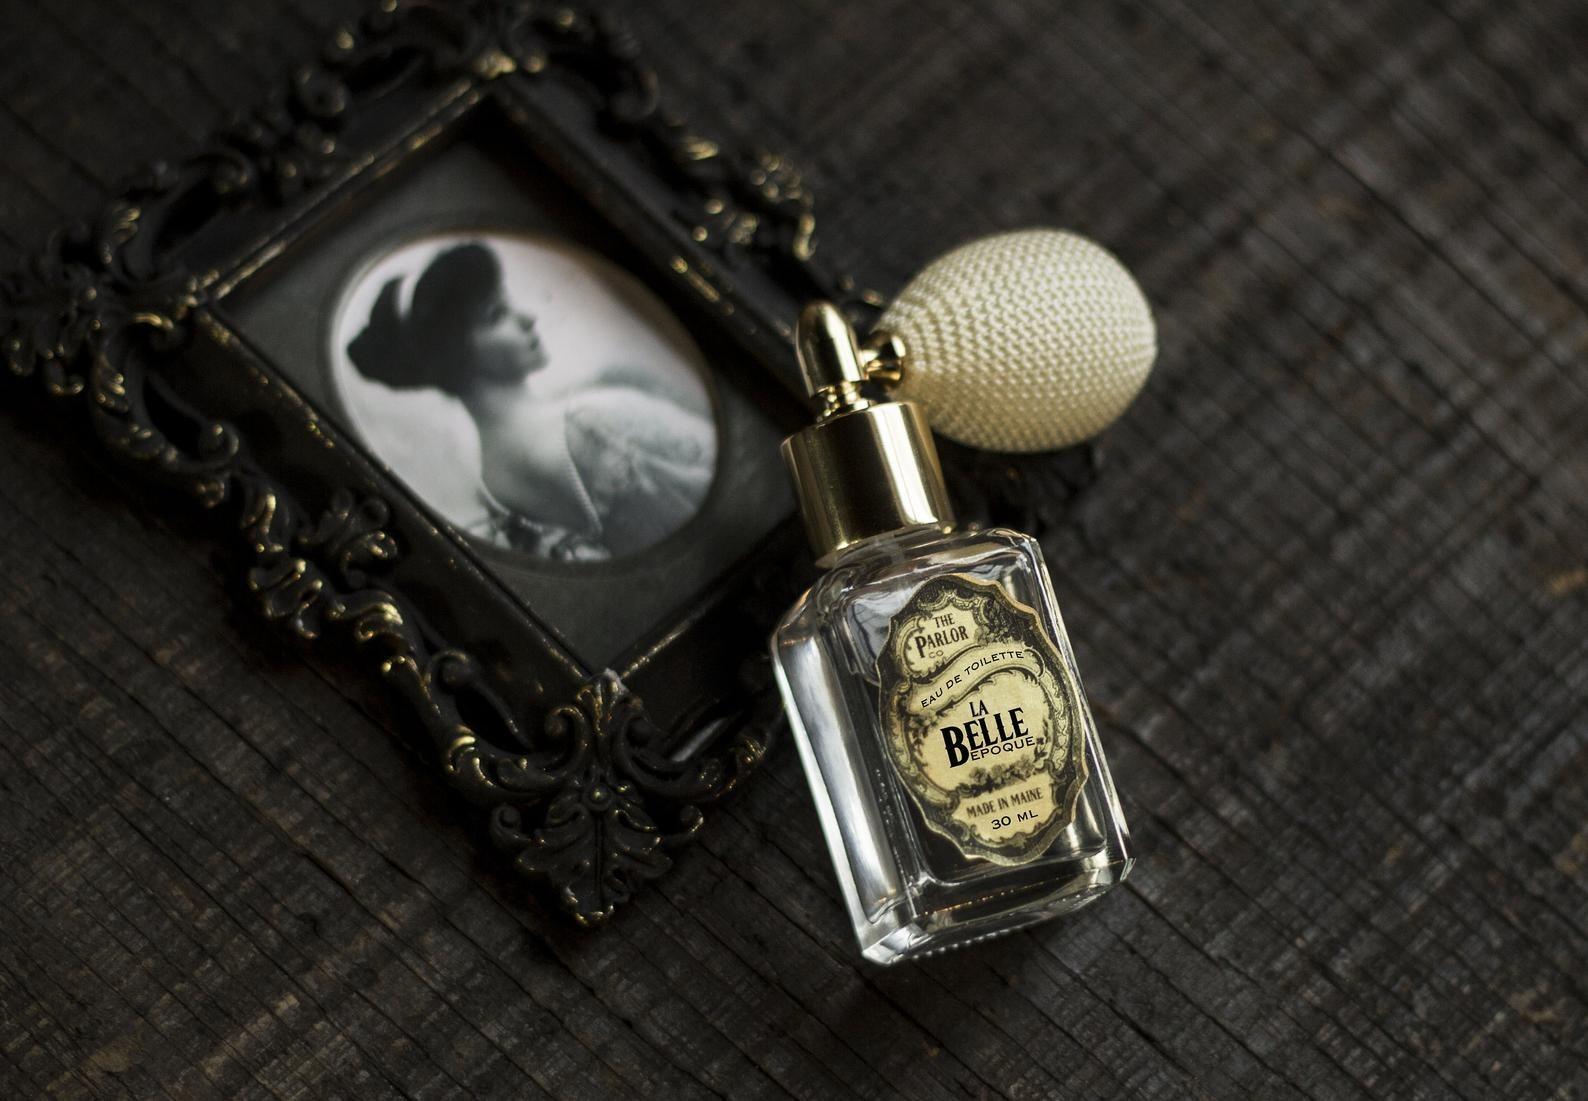 tiny perfume bottle next to an old photo